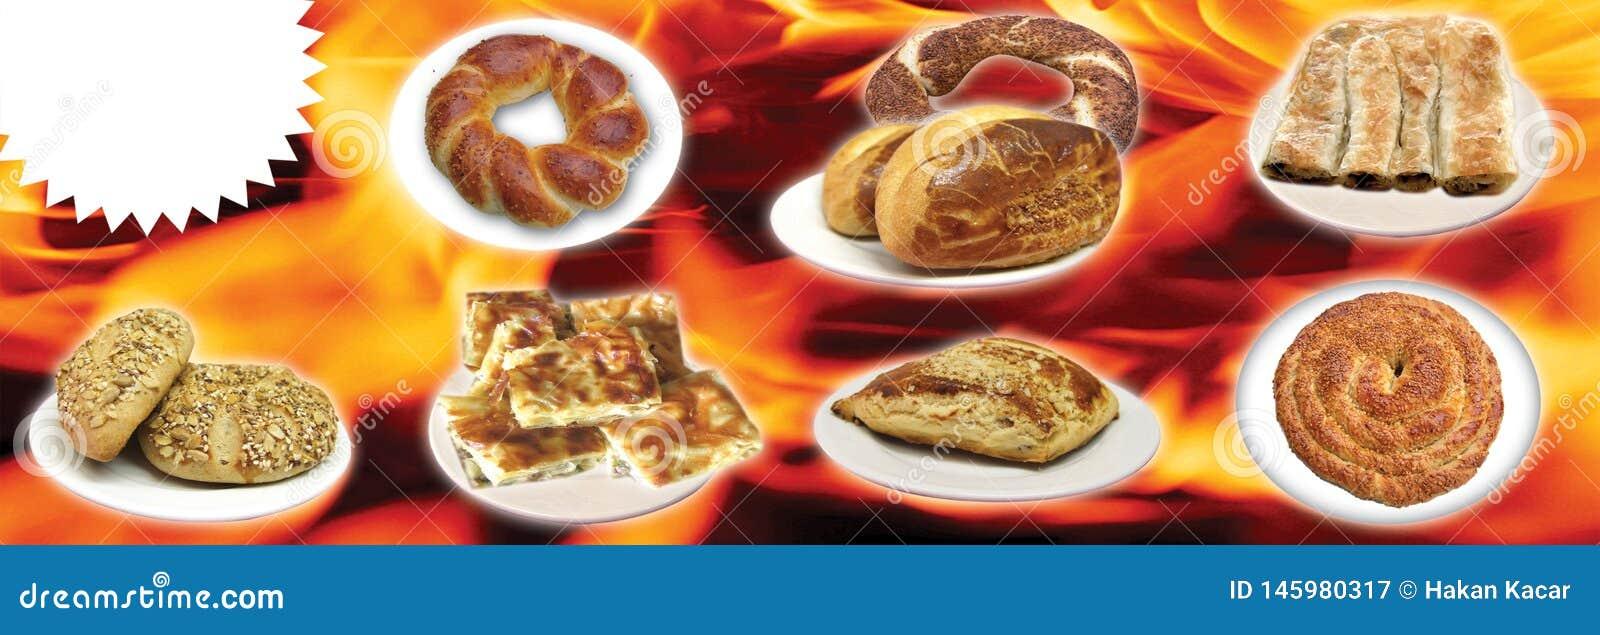 Turkish foods, Turkish Speak: türk yemekleri, doner,